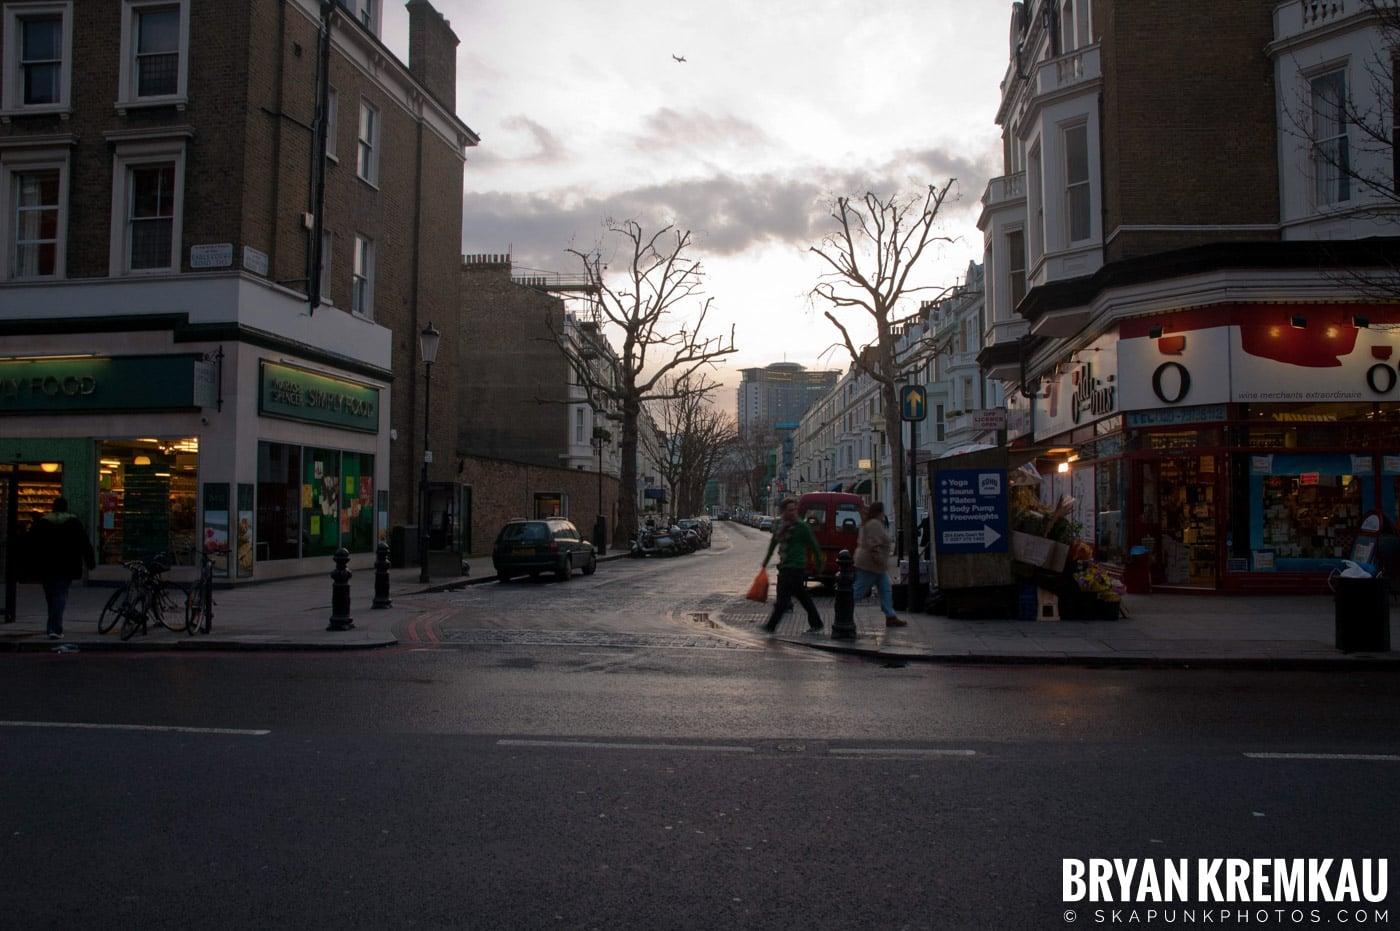 London, England - Day 1 - 12.8.06 (2)